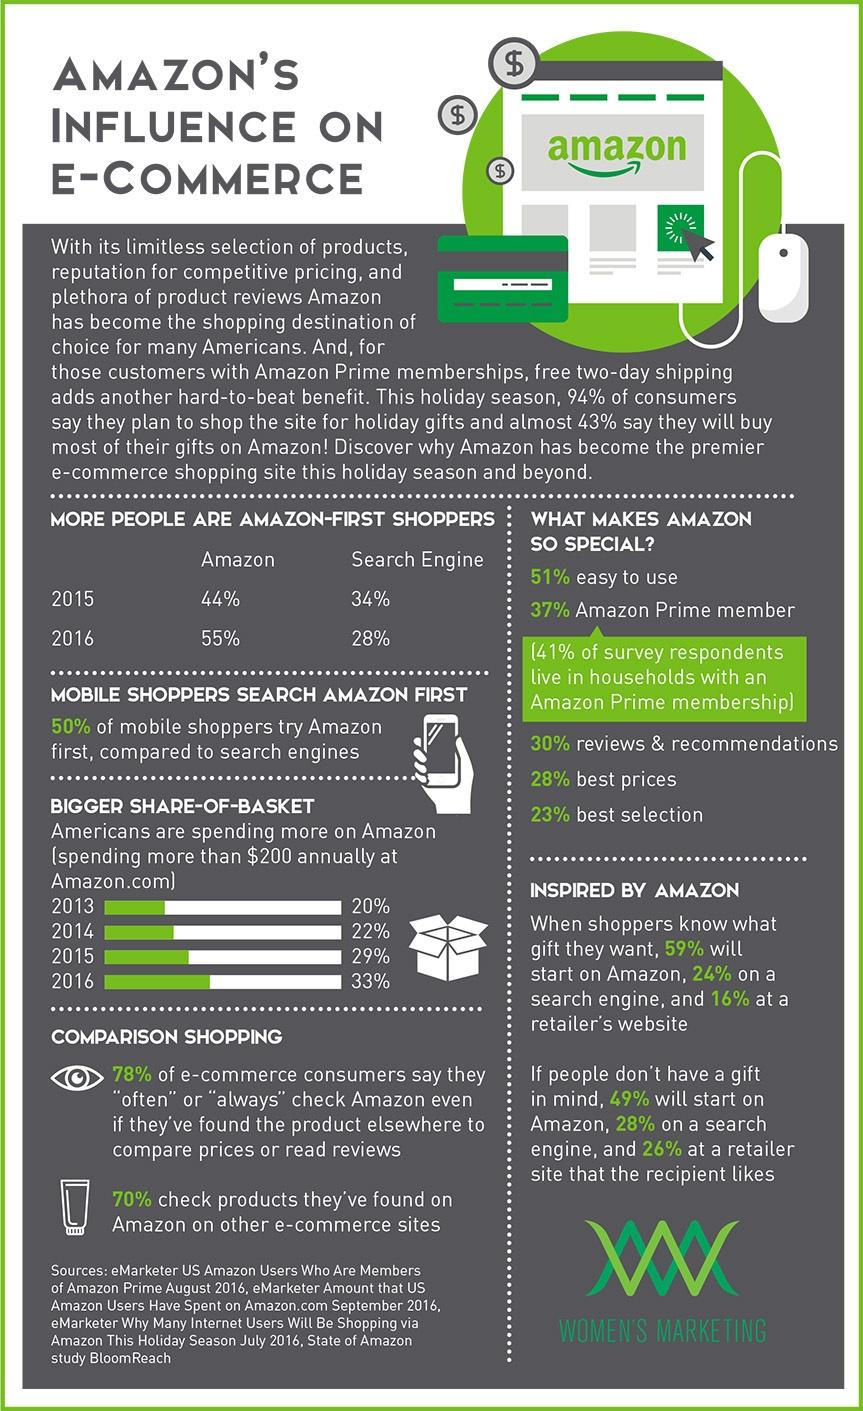 AmazonsInfluenceonECommerce_Infographic.jpg